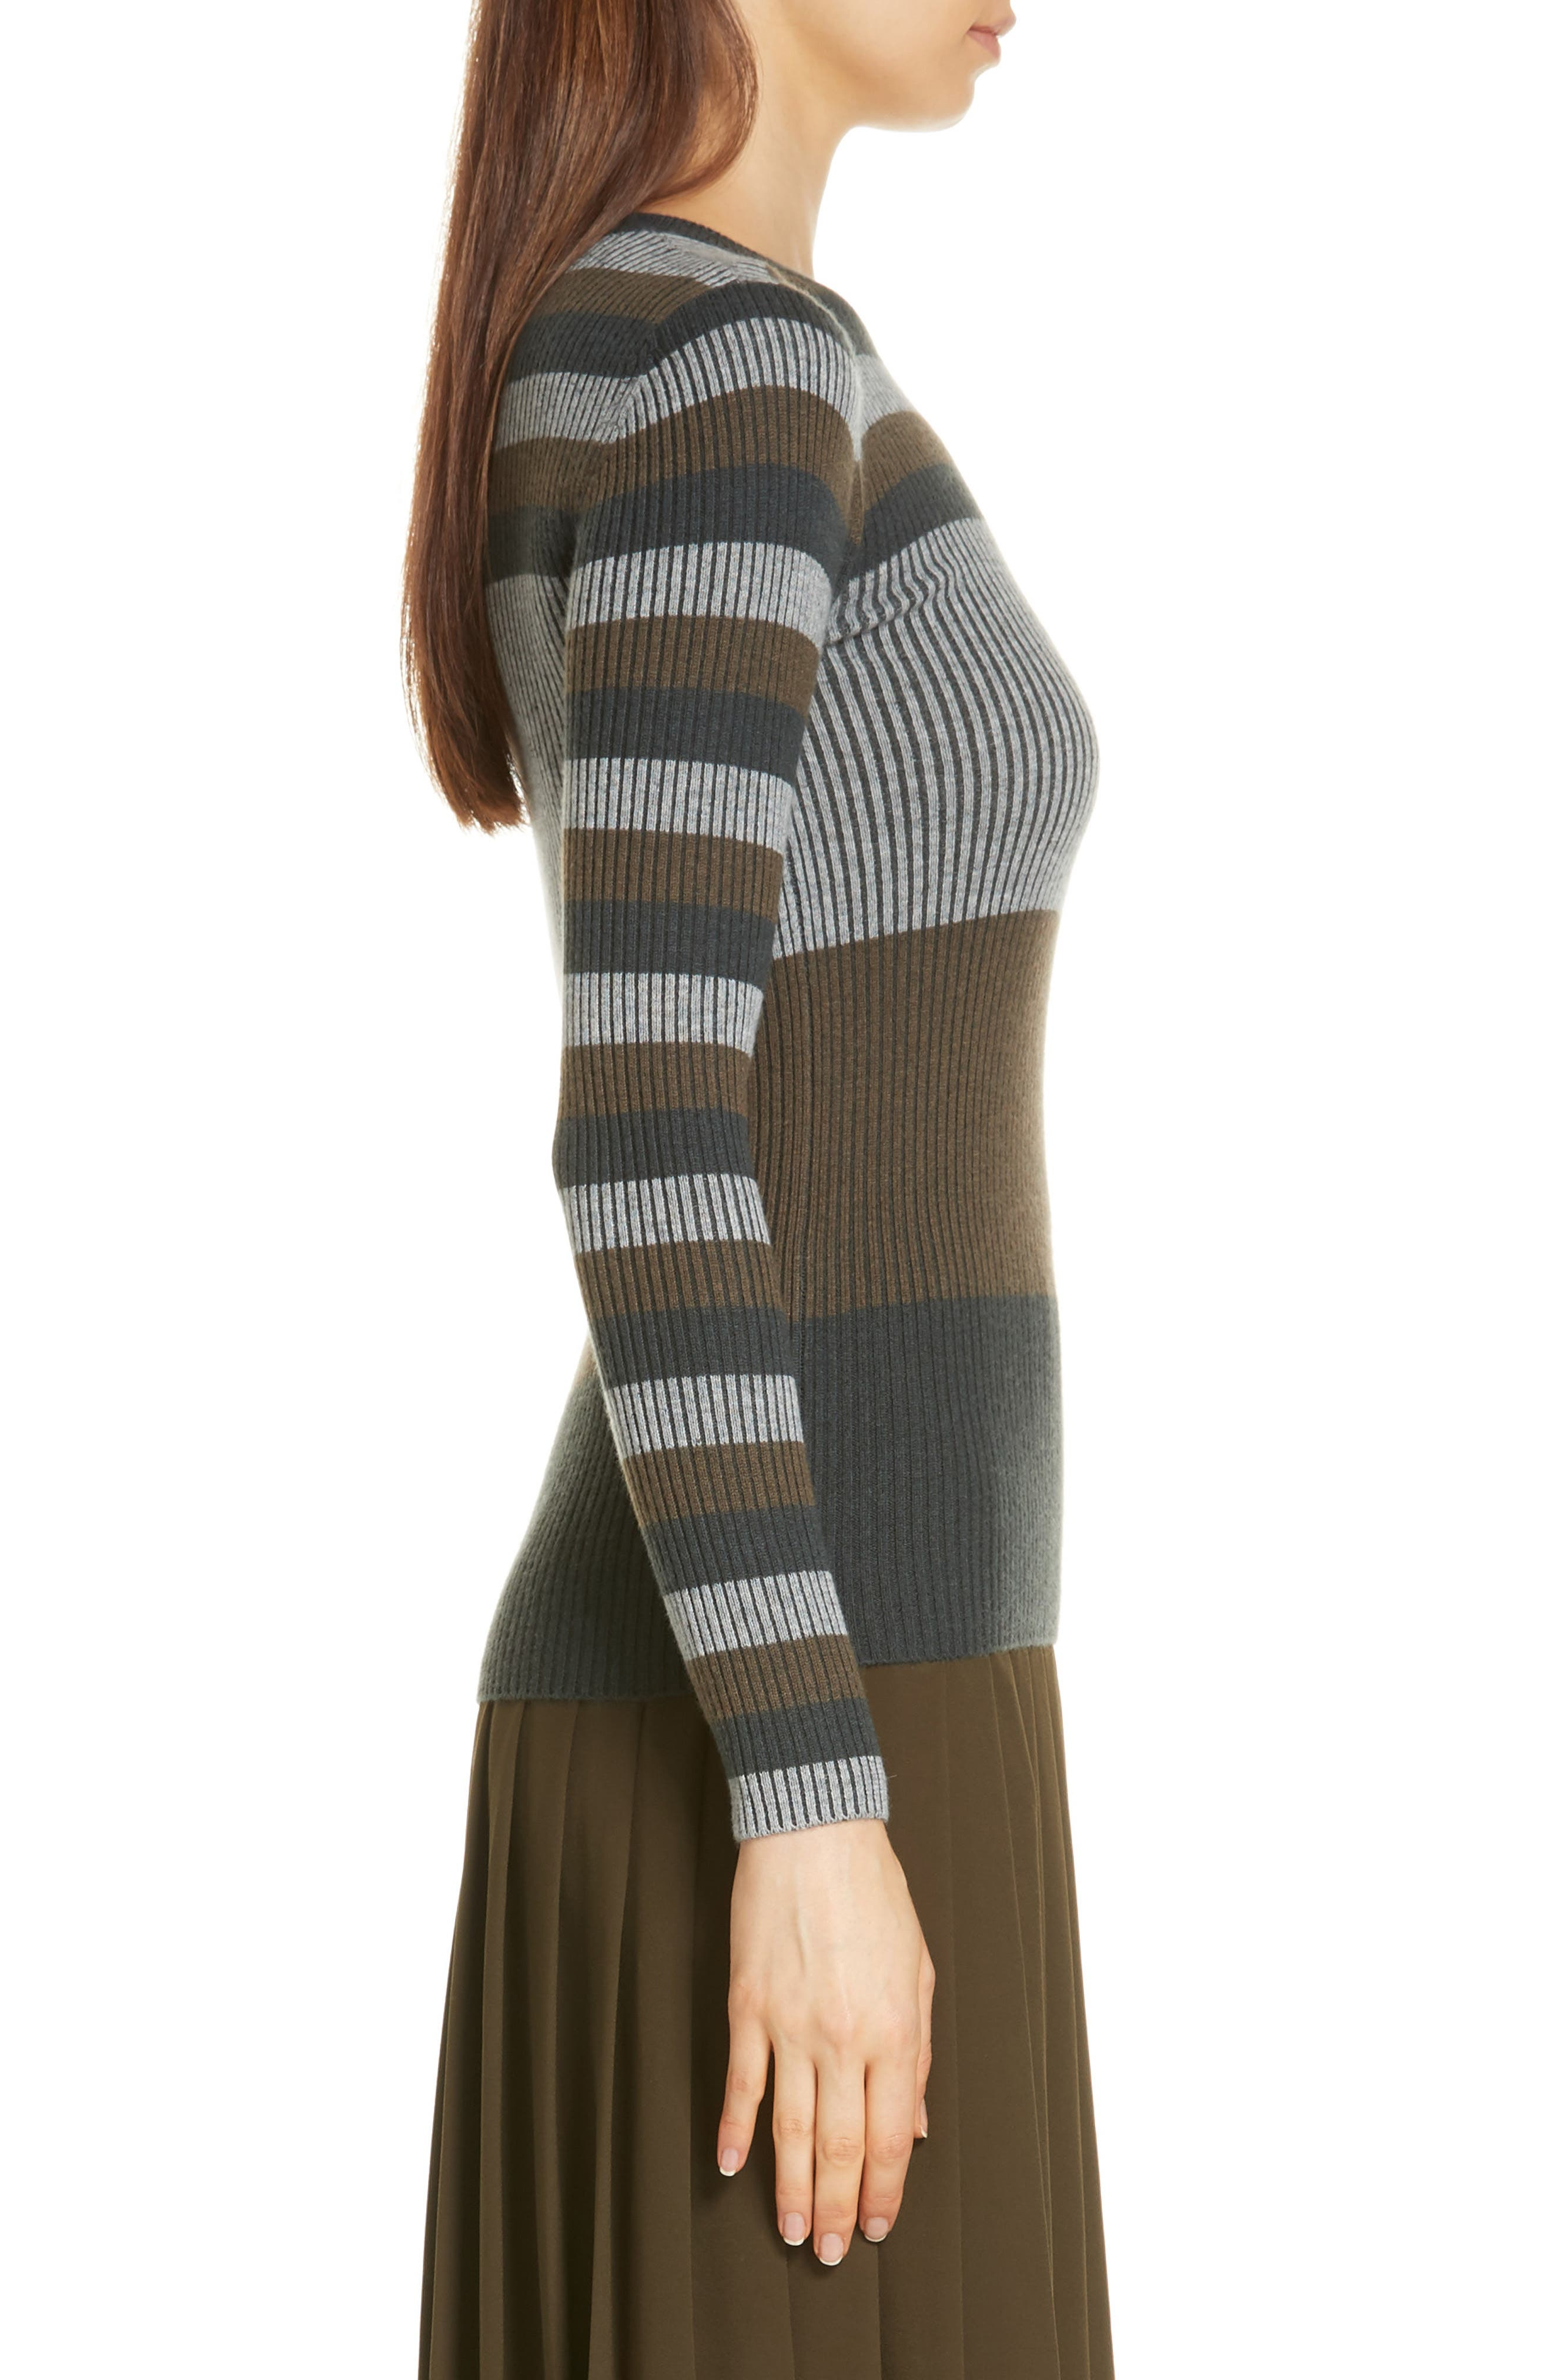 NORDSTROM SIGNATURE,                             Stripe Cashmere Sweater,                             Alternate thumbnail 3, color,                             315